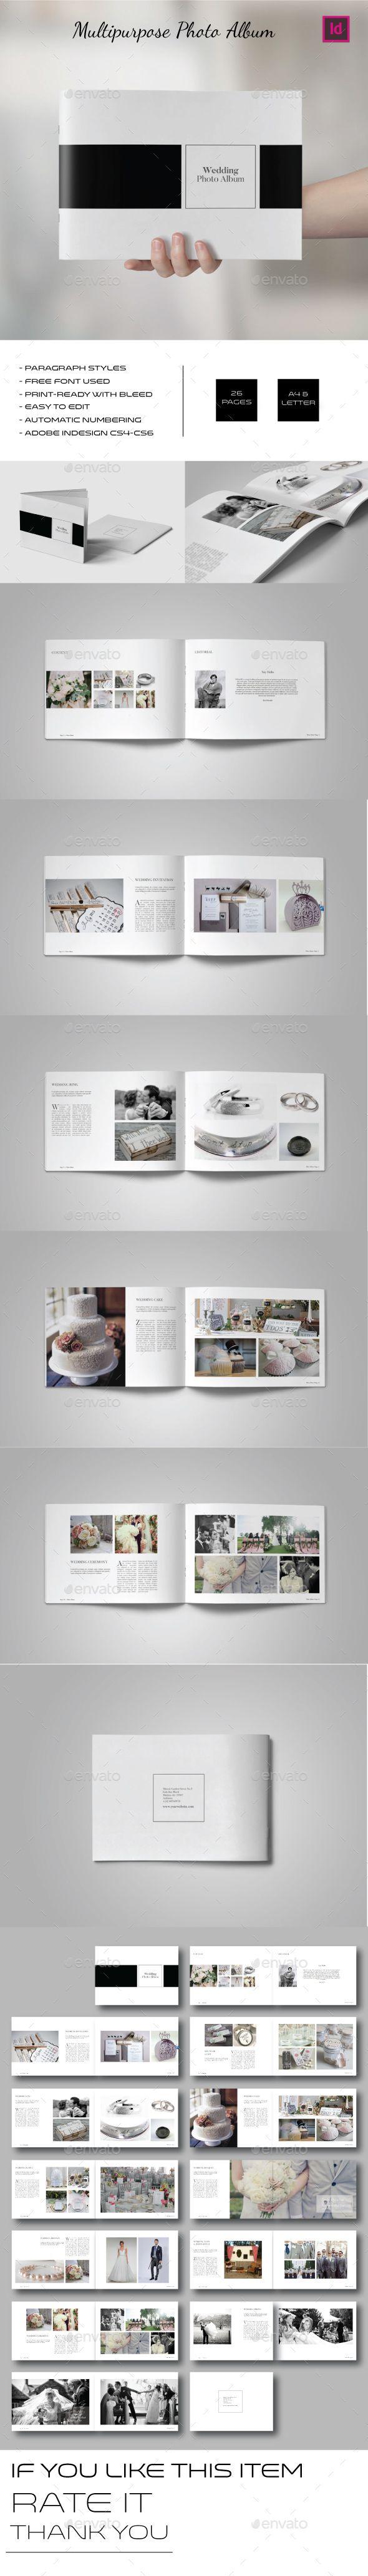 Multipurpose Landscape Photo Album Template InDesign INDD. Download here: graphi...